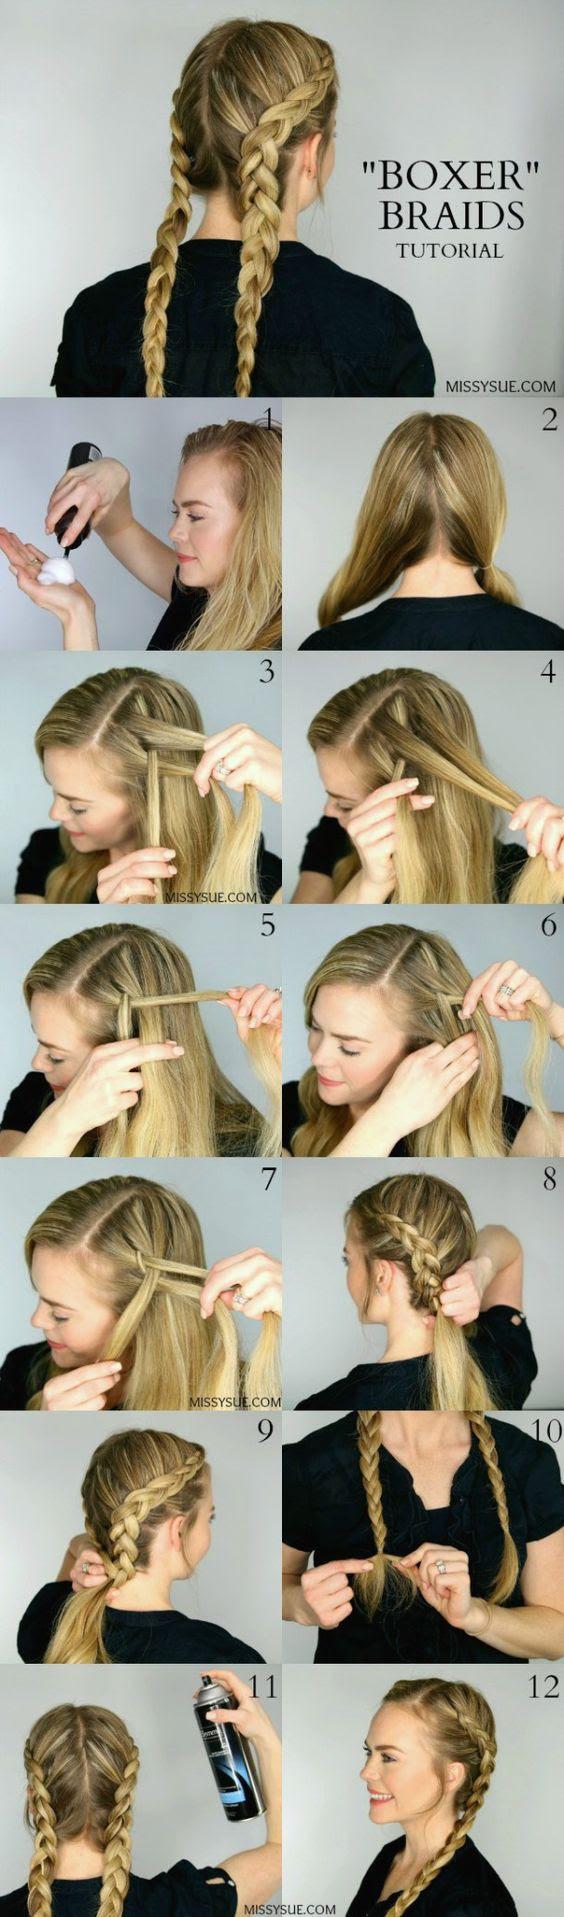 12 Braided Hair Tutorials For Spring 2017 Pretty Designs